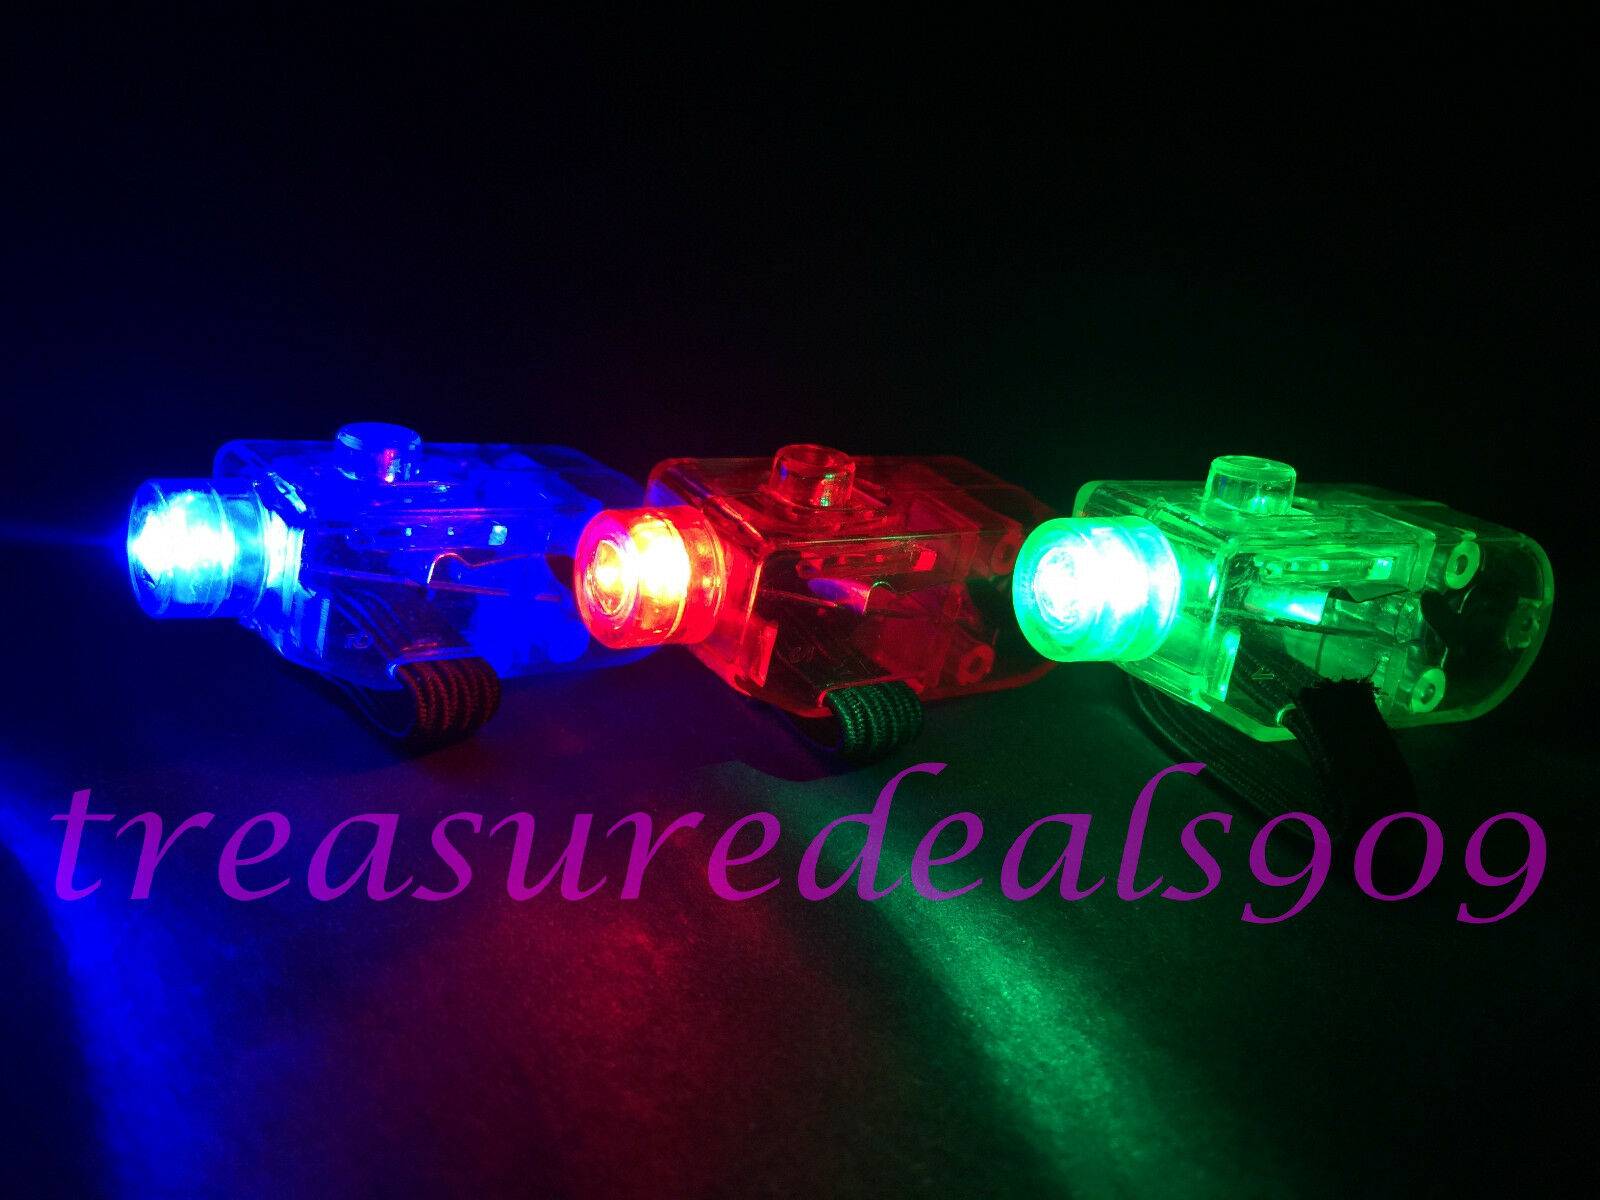 FREE SHIPPING 500 pcs Mix RGB LED Party Laser Finger Light Beam Ring Club Rave